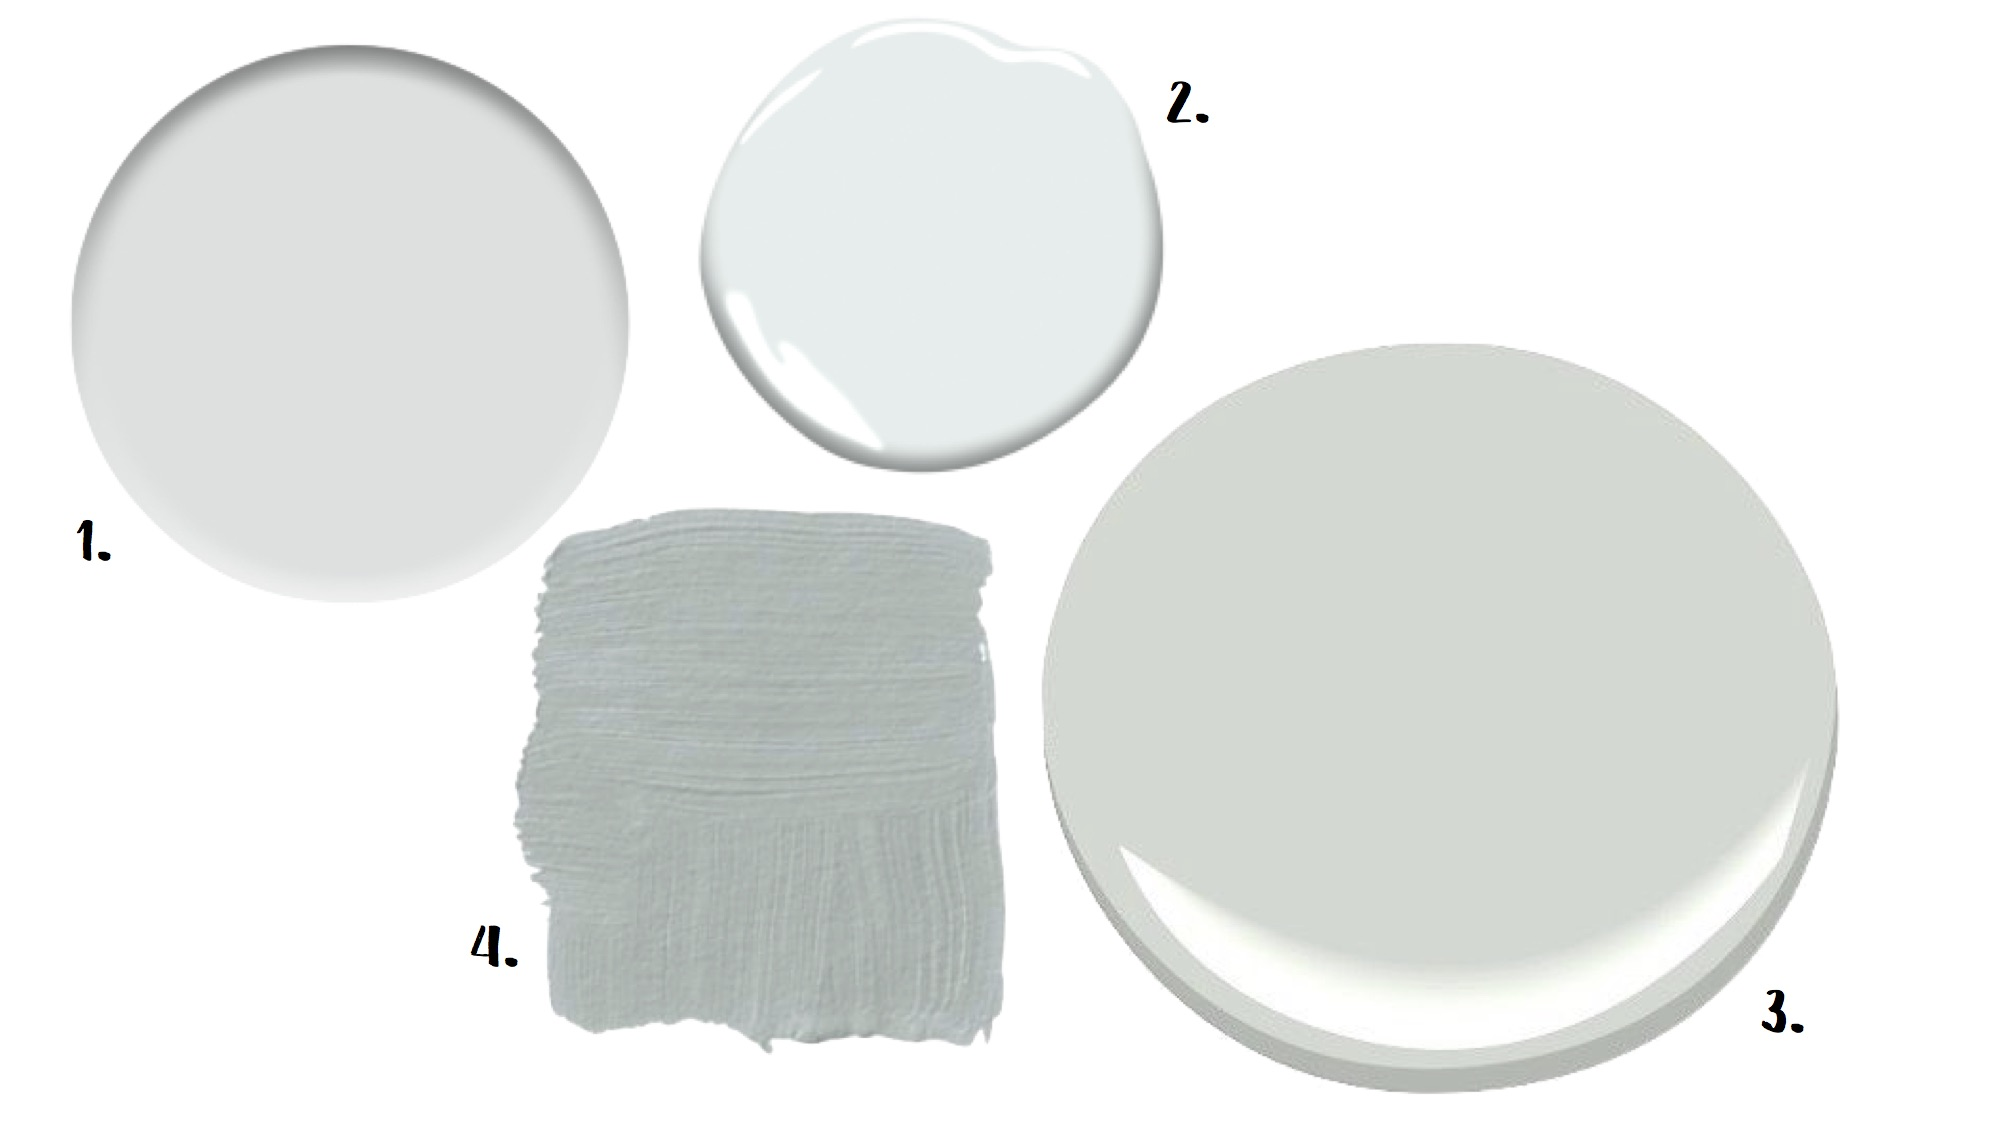 1. Quick Silver (Sherwin Williams) 2. Patriotic Blue (Benjamin Moore) 3. Wickham Gray (Benjamin Moore 4. Light Blue (Farrow and Ball)